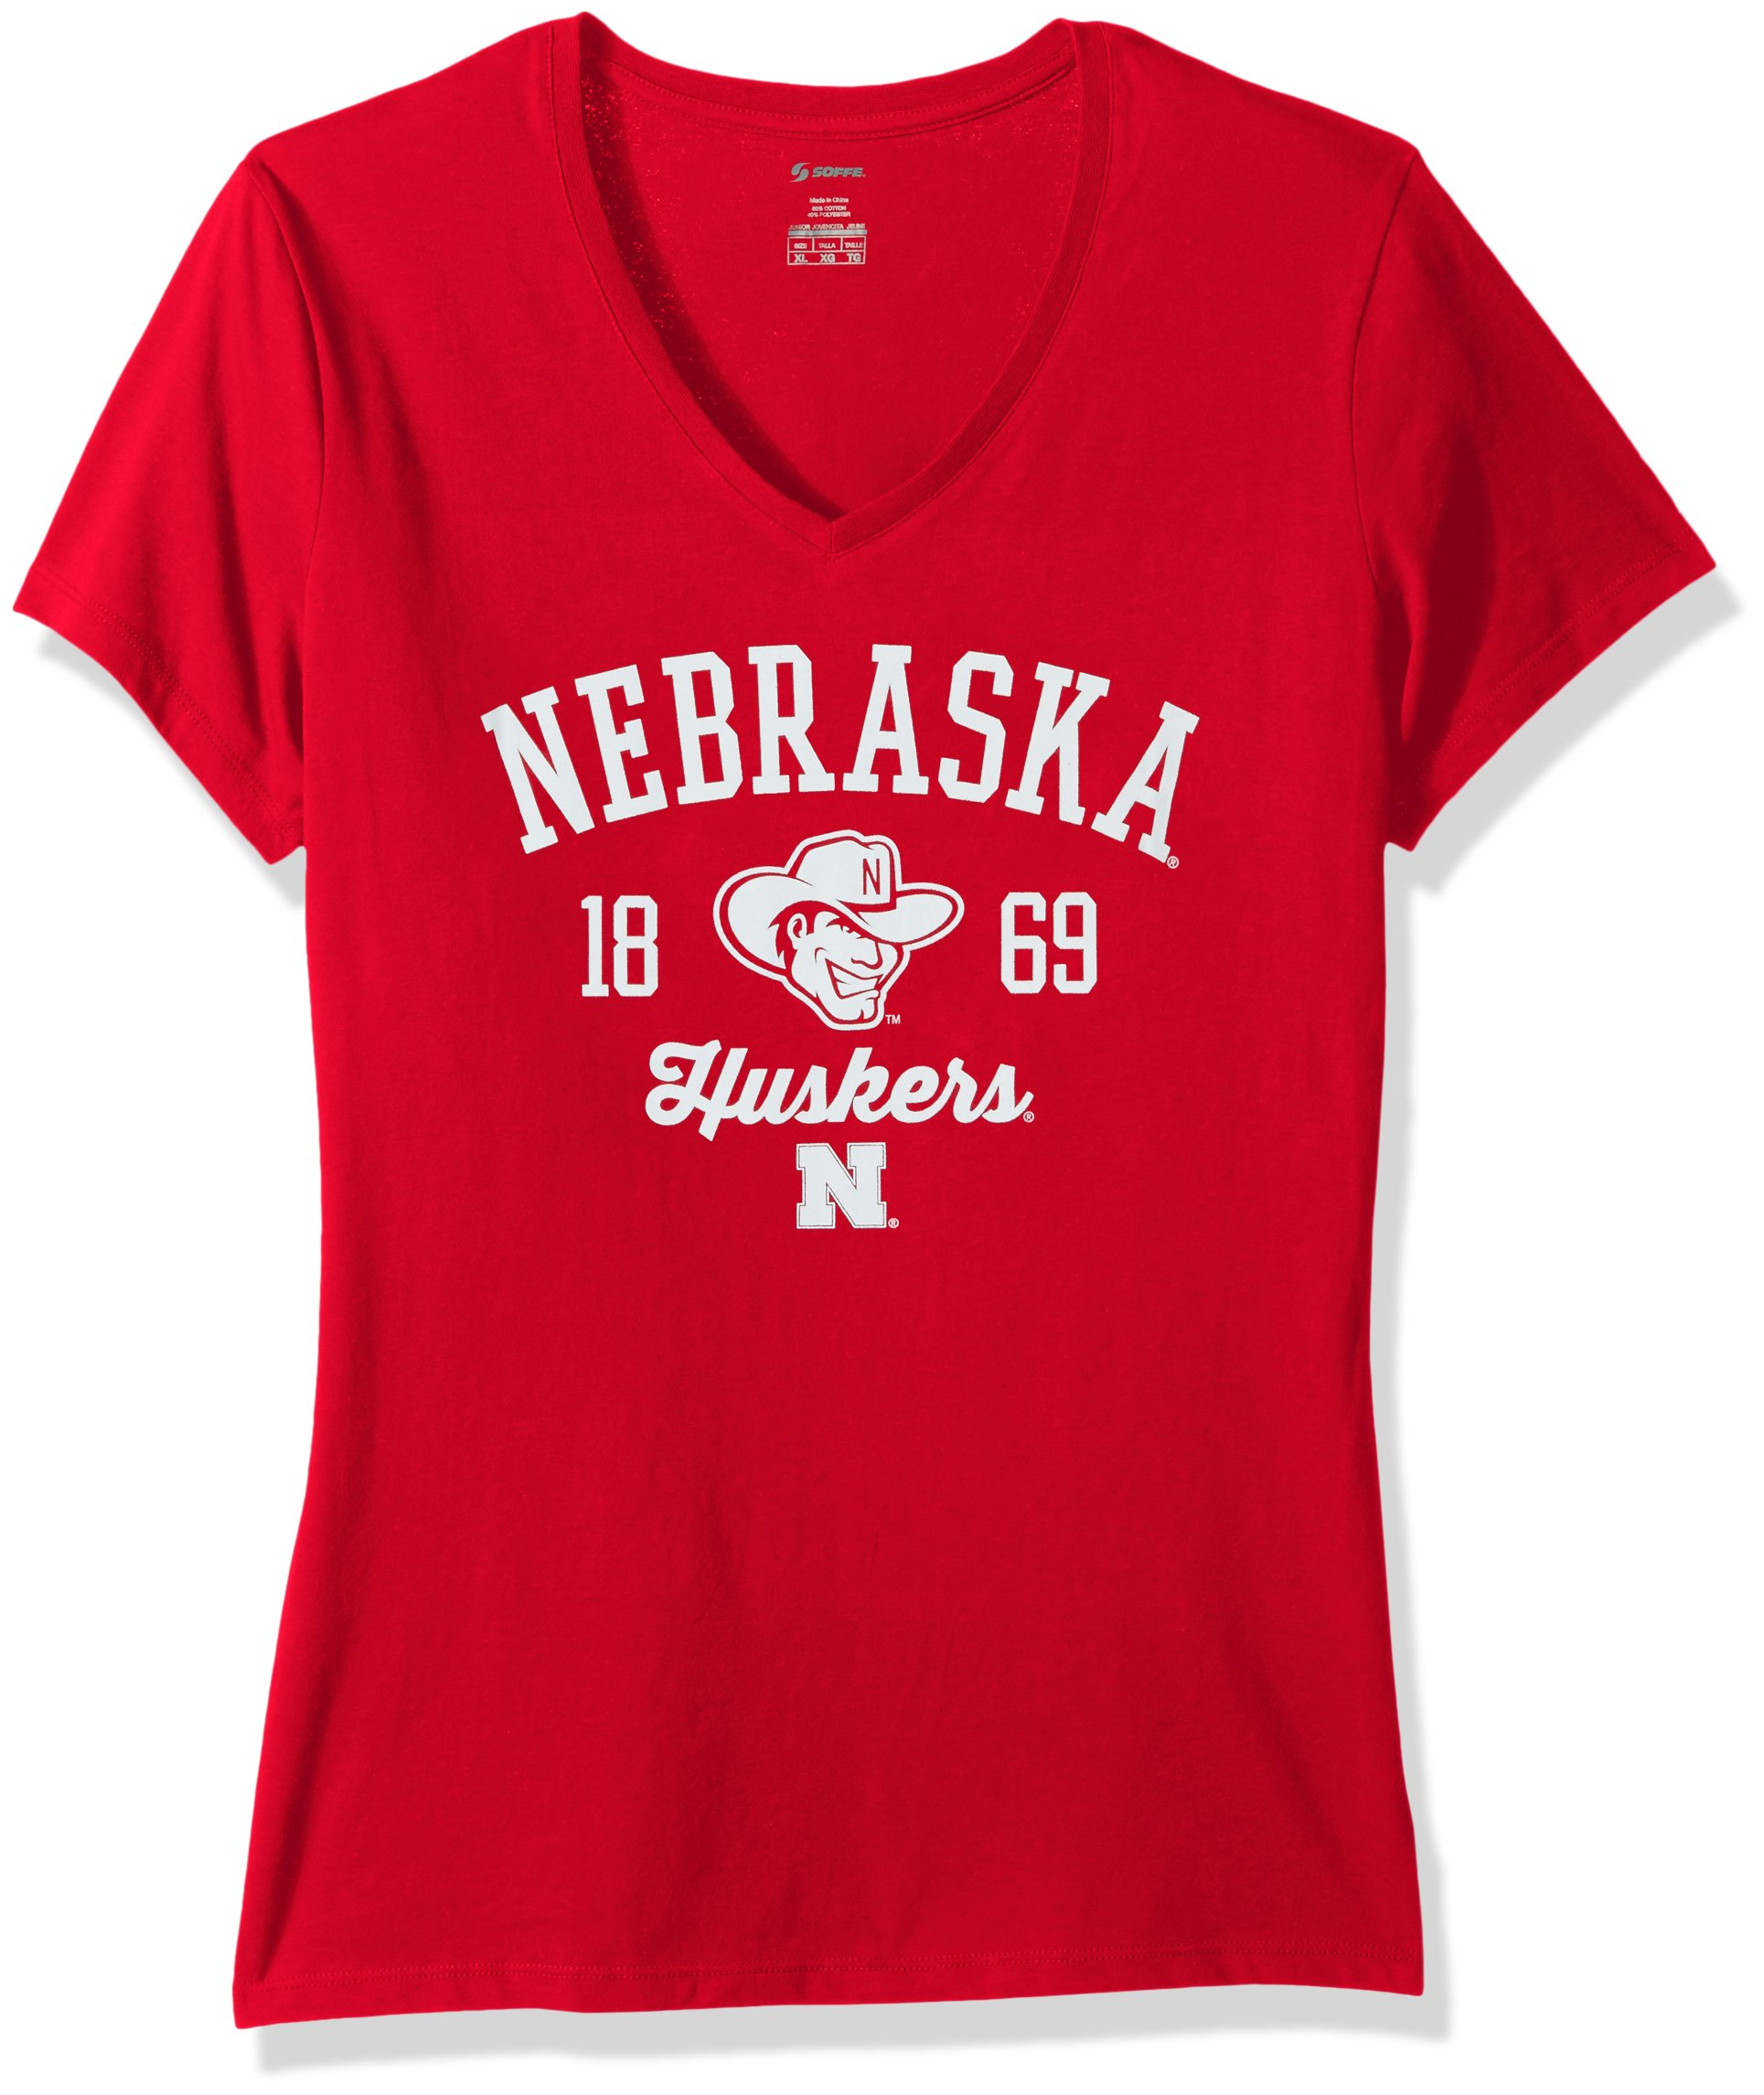 Nebraska Cornhuskers S Ts Shirts